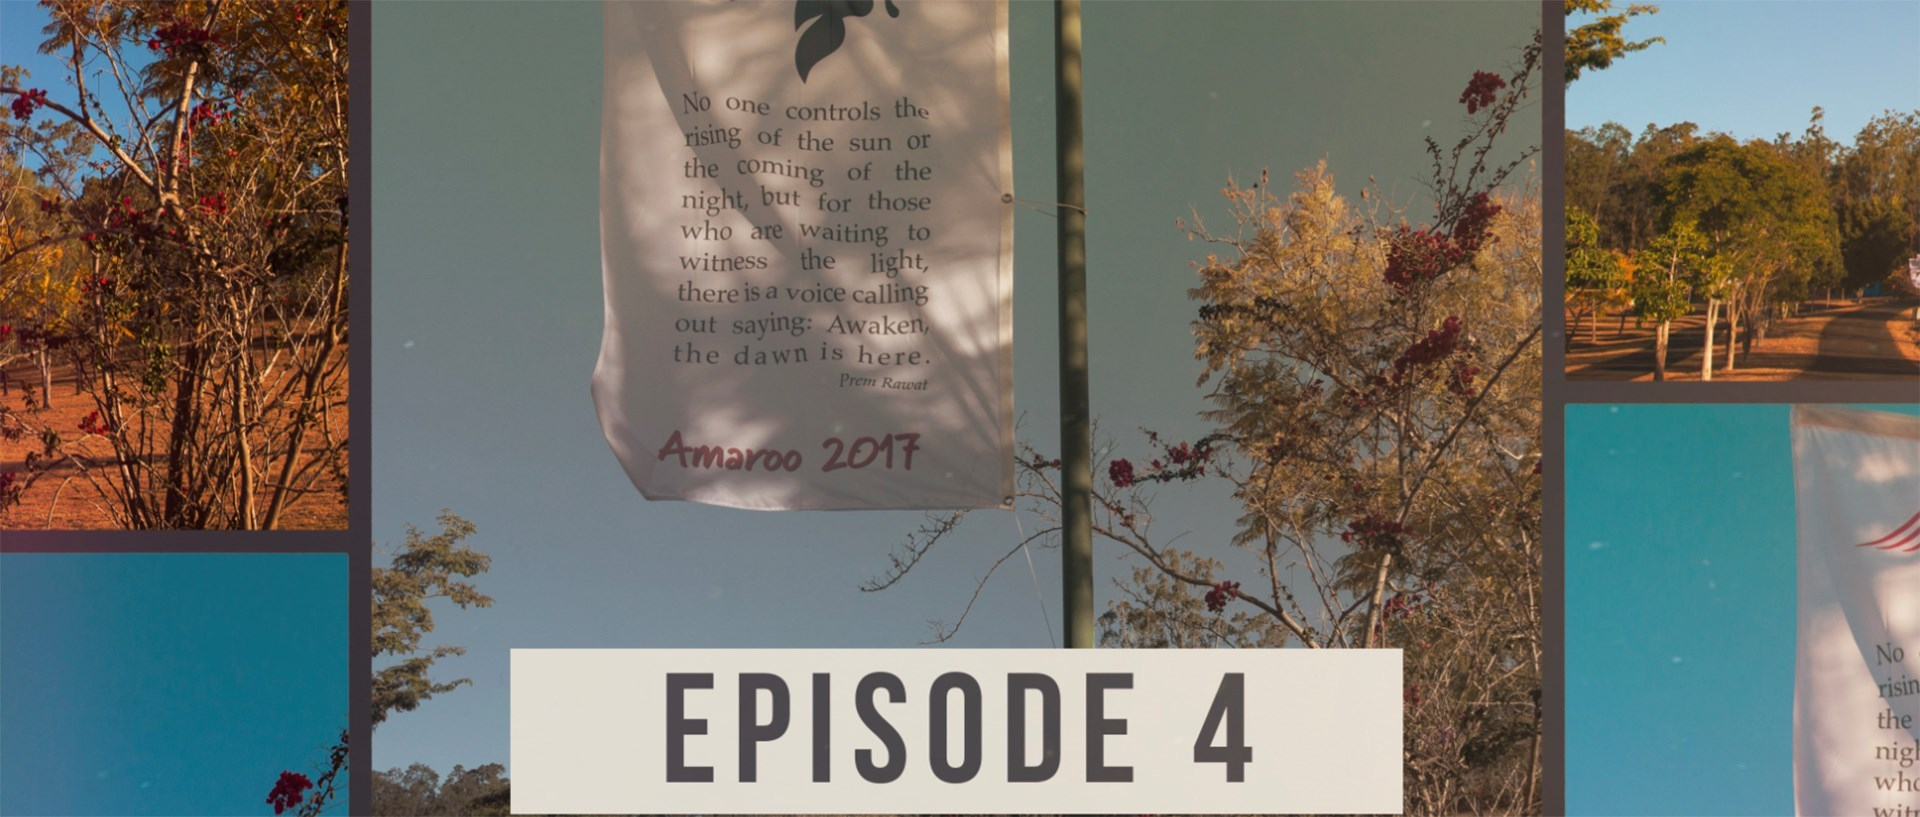 Amaroo 2017 Series Episode 4 Audio